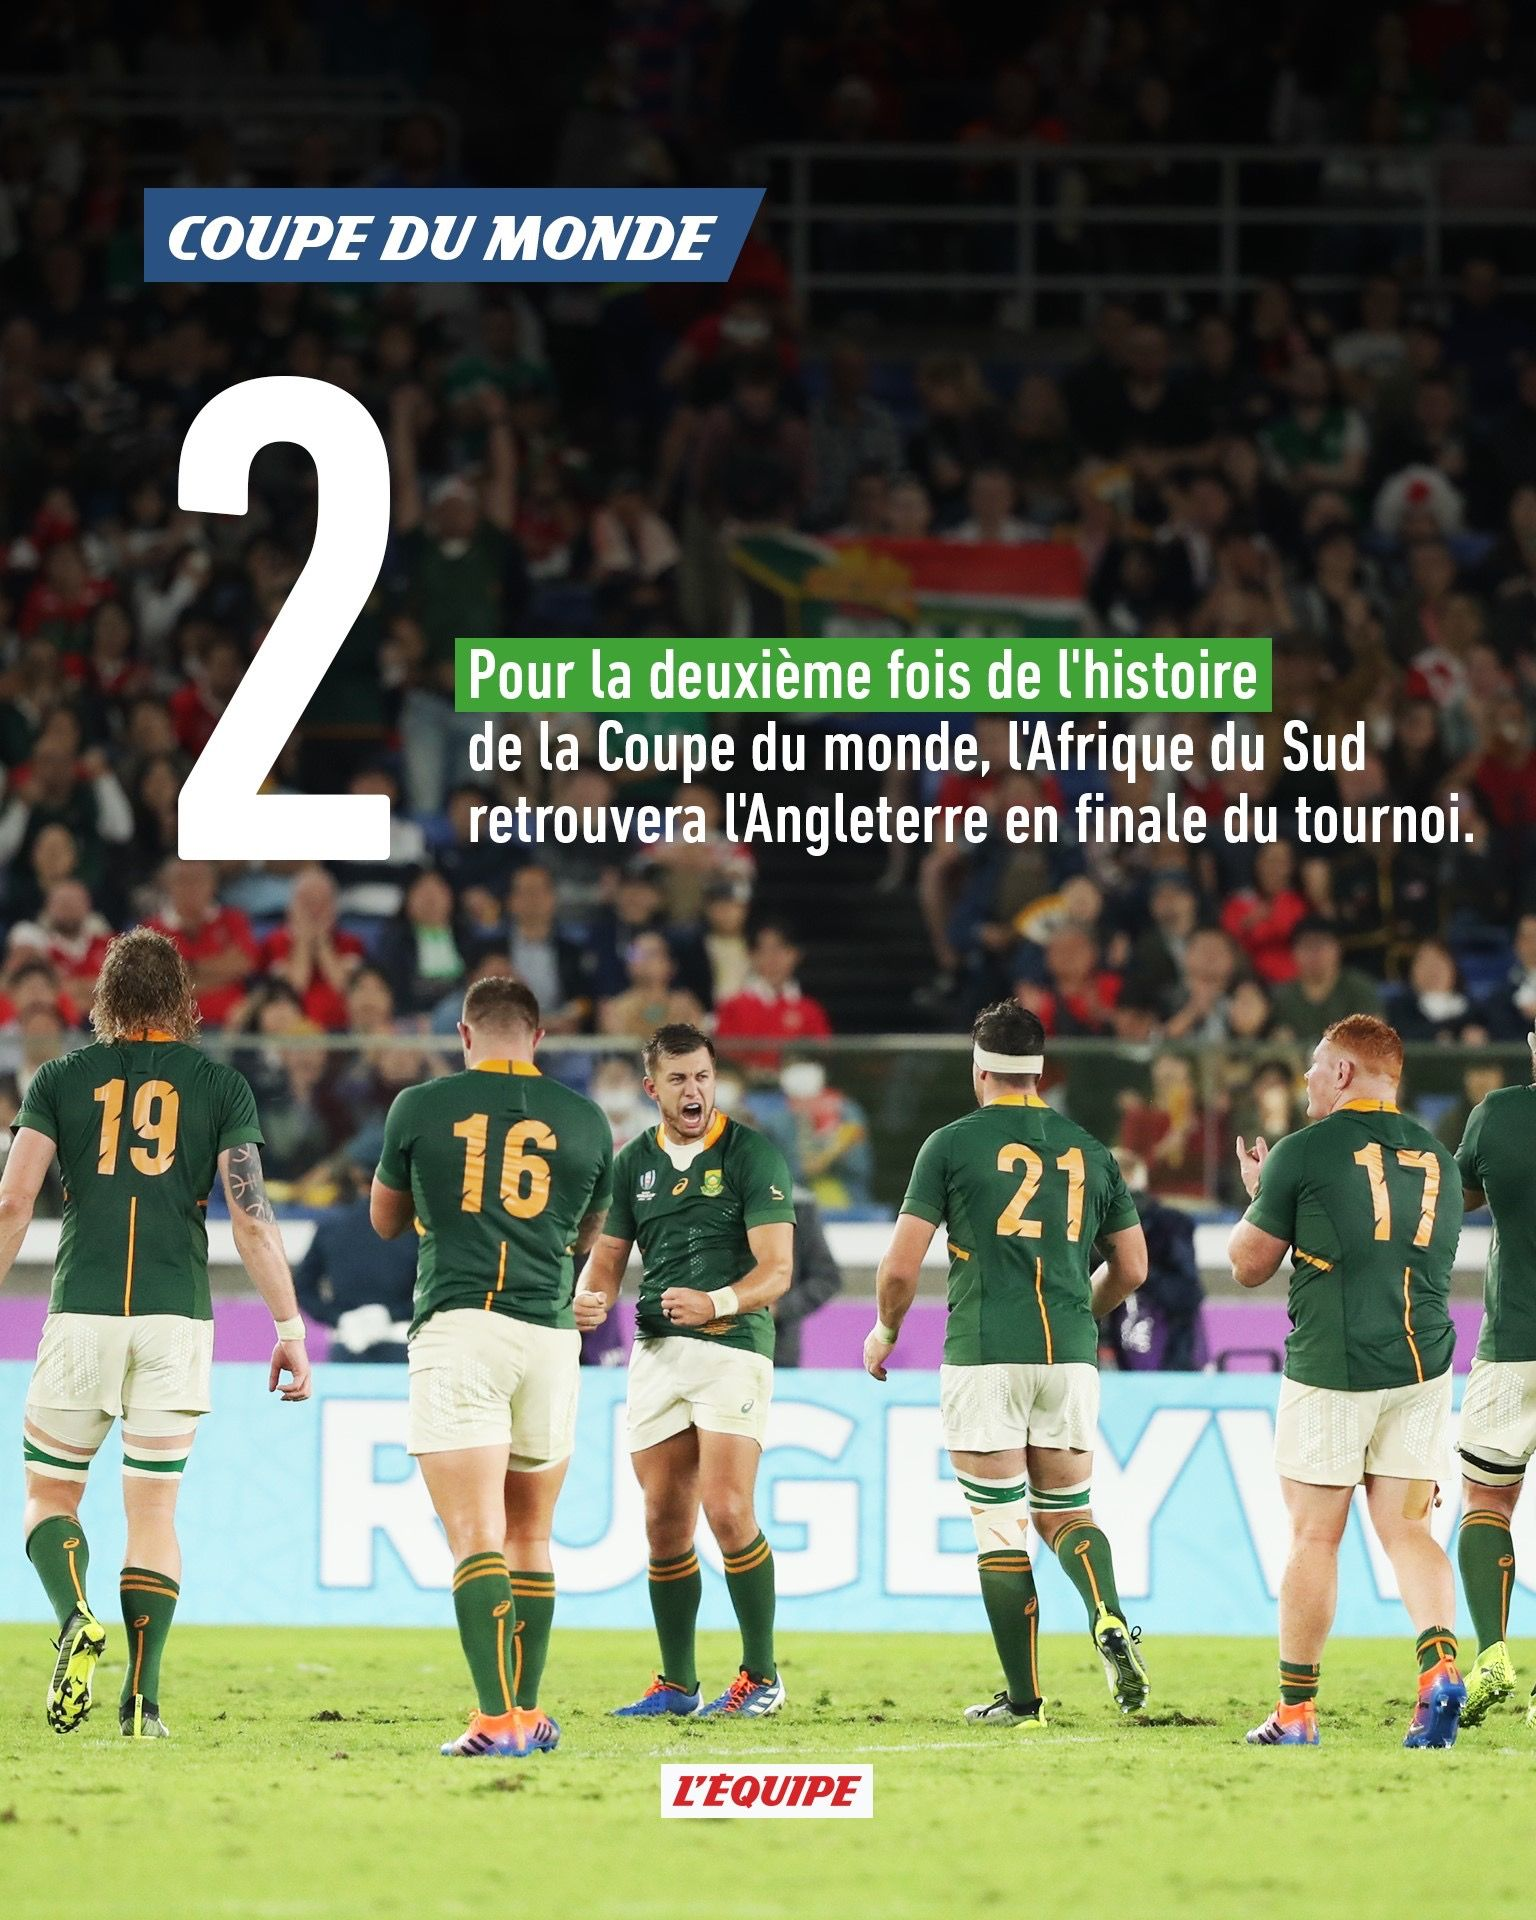 Rugby Rwc2019 Rugbyworldcup Southafrica Wales Semifinal Coupe Du Monde Afrique Du Sud Afrique